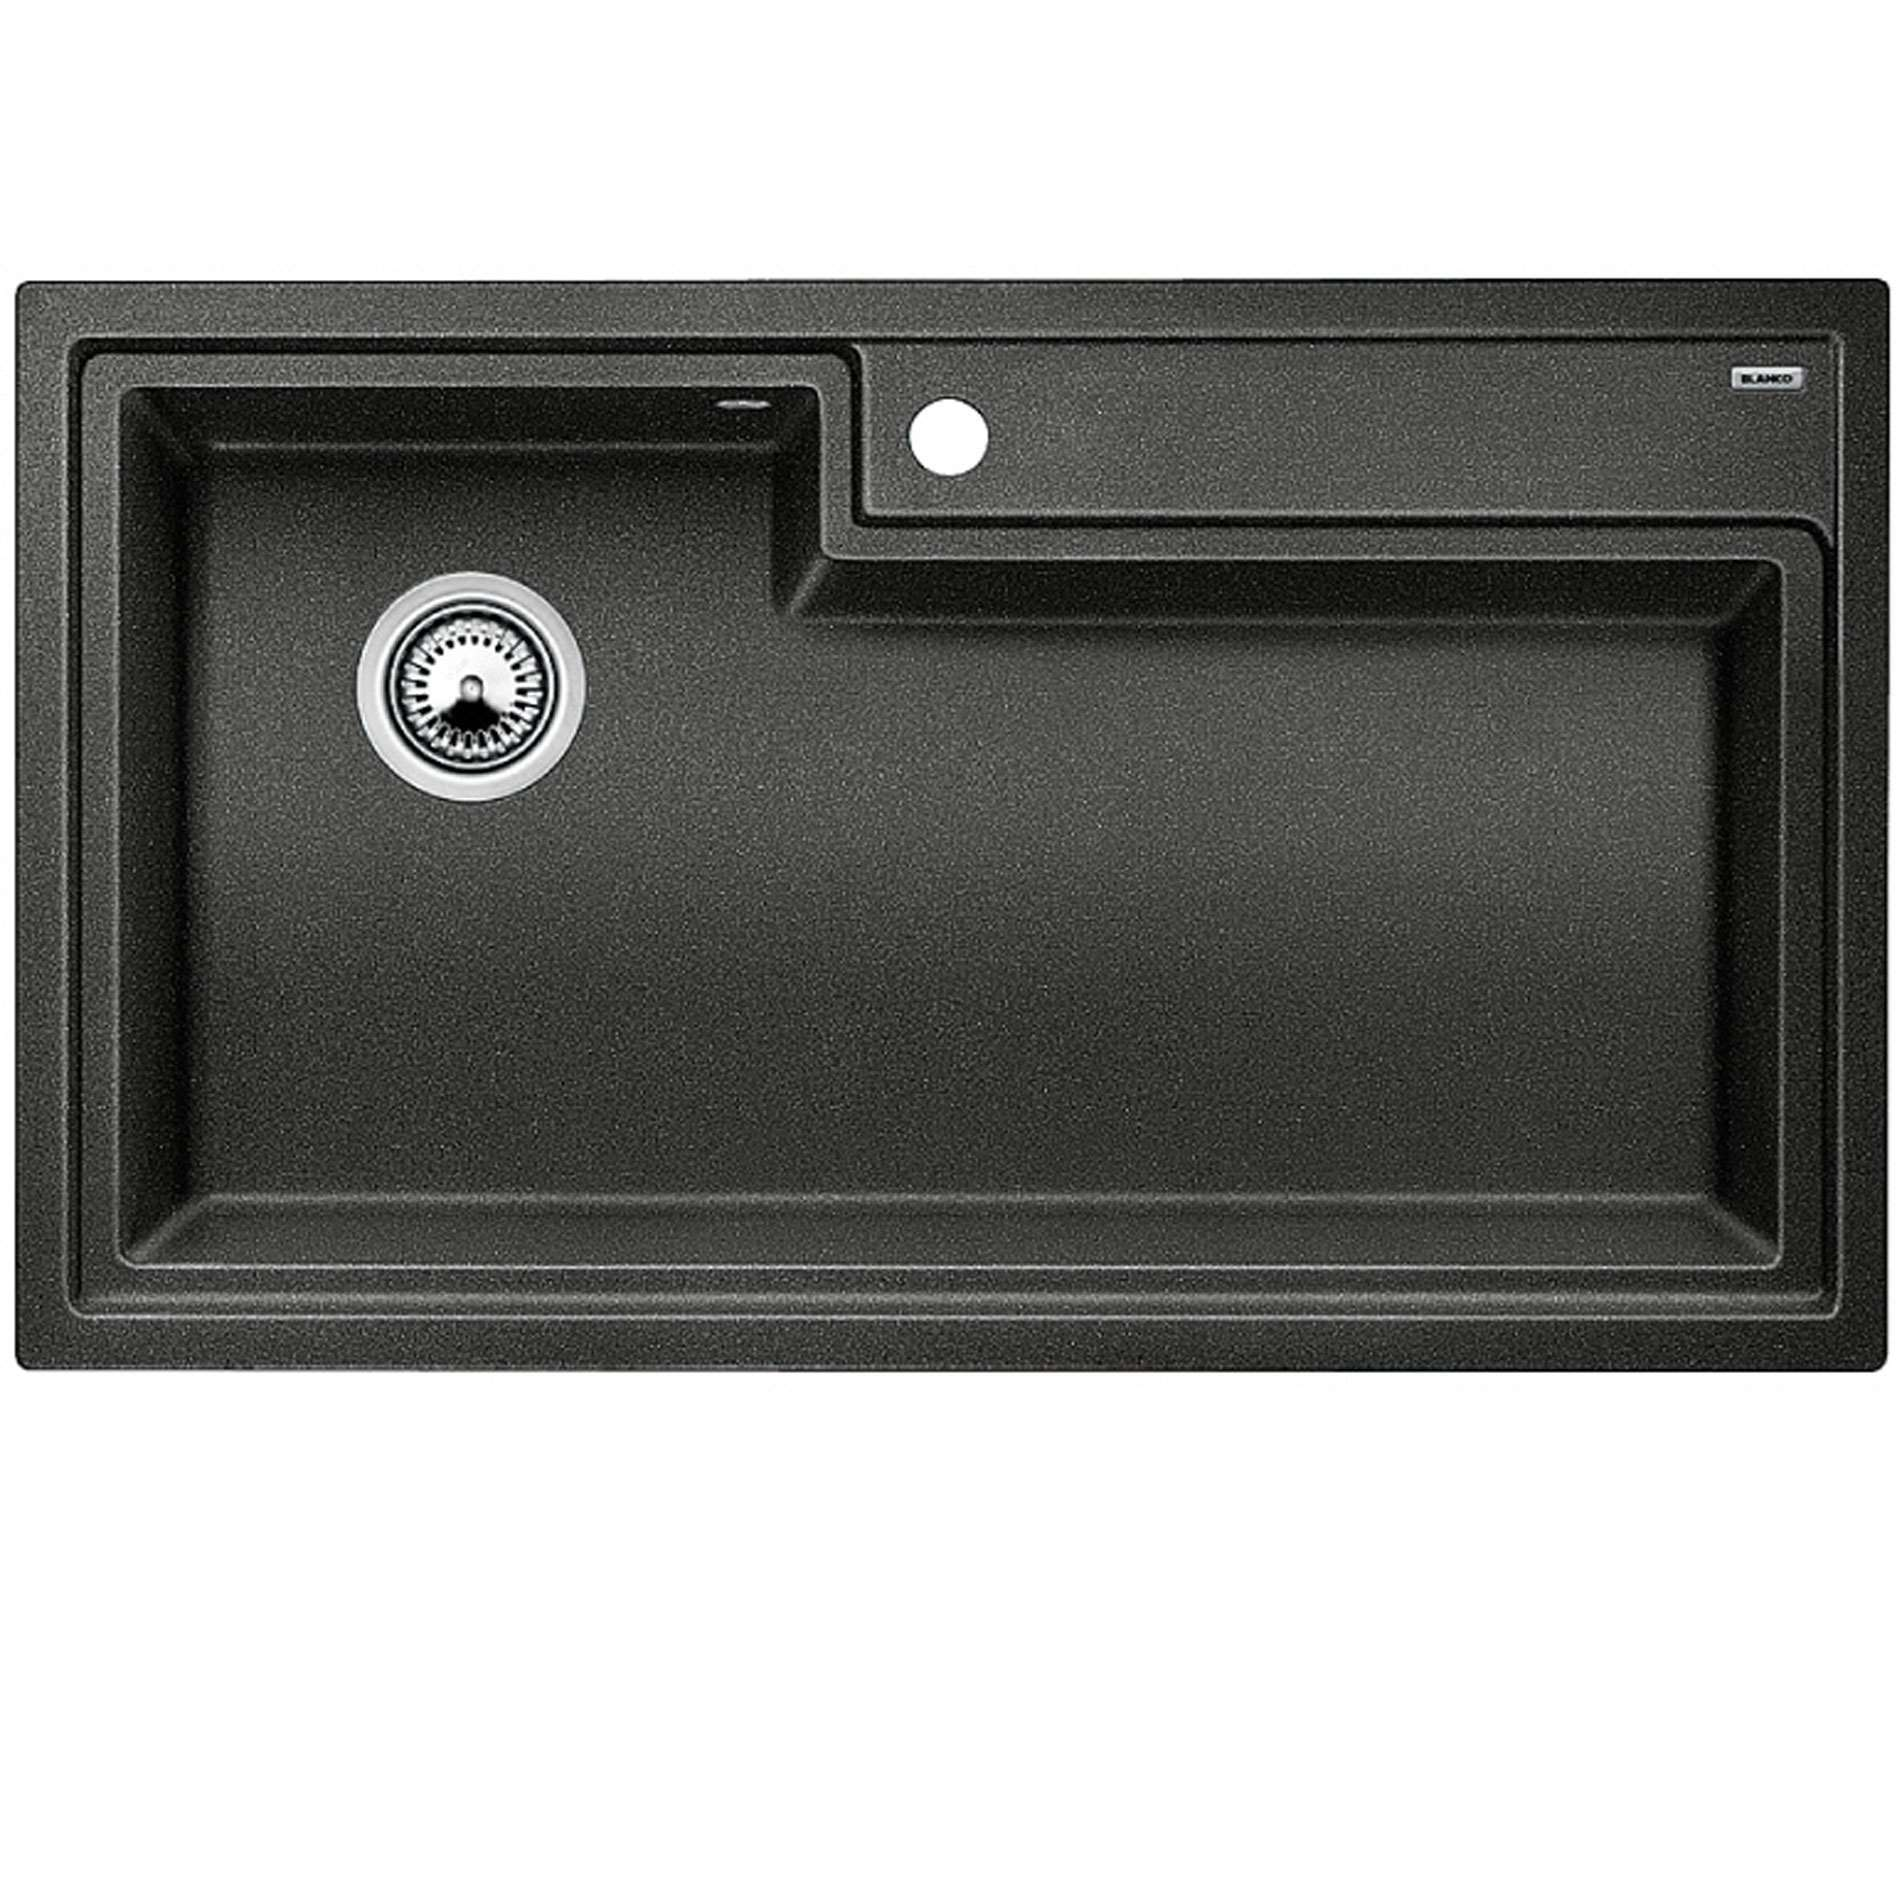 Blanco Silgranit Anthracite Sink : Blanco: Plenta Anthracite Silgranit Sink - Kitchen Sinks & Taps